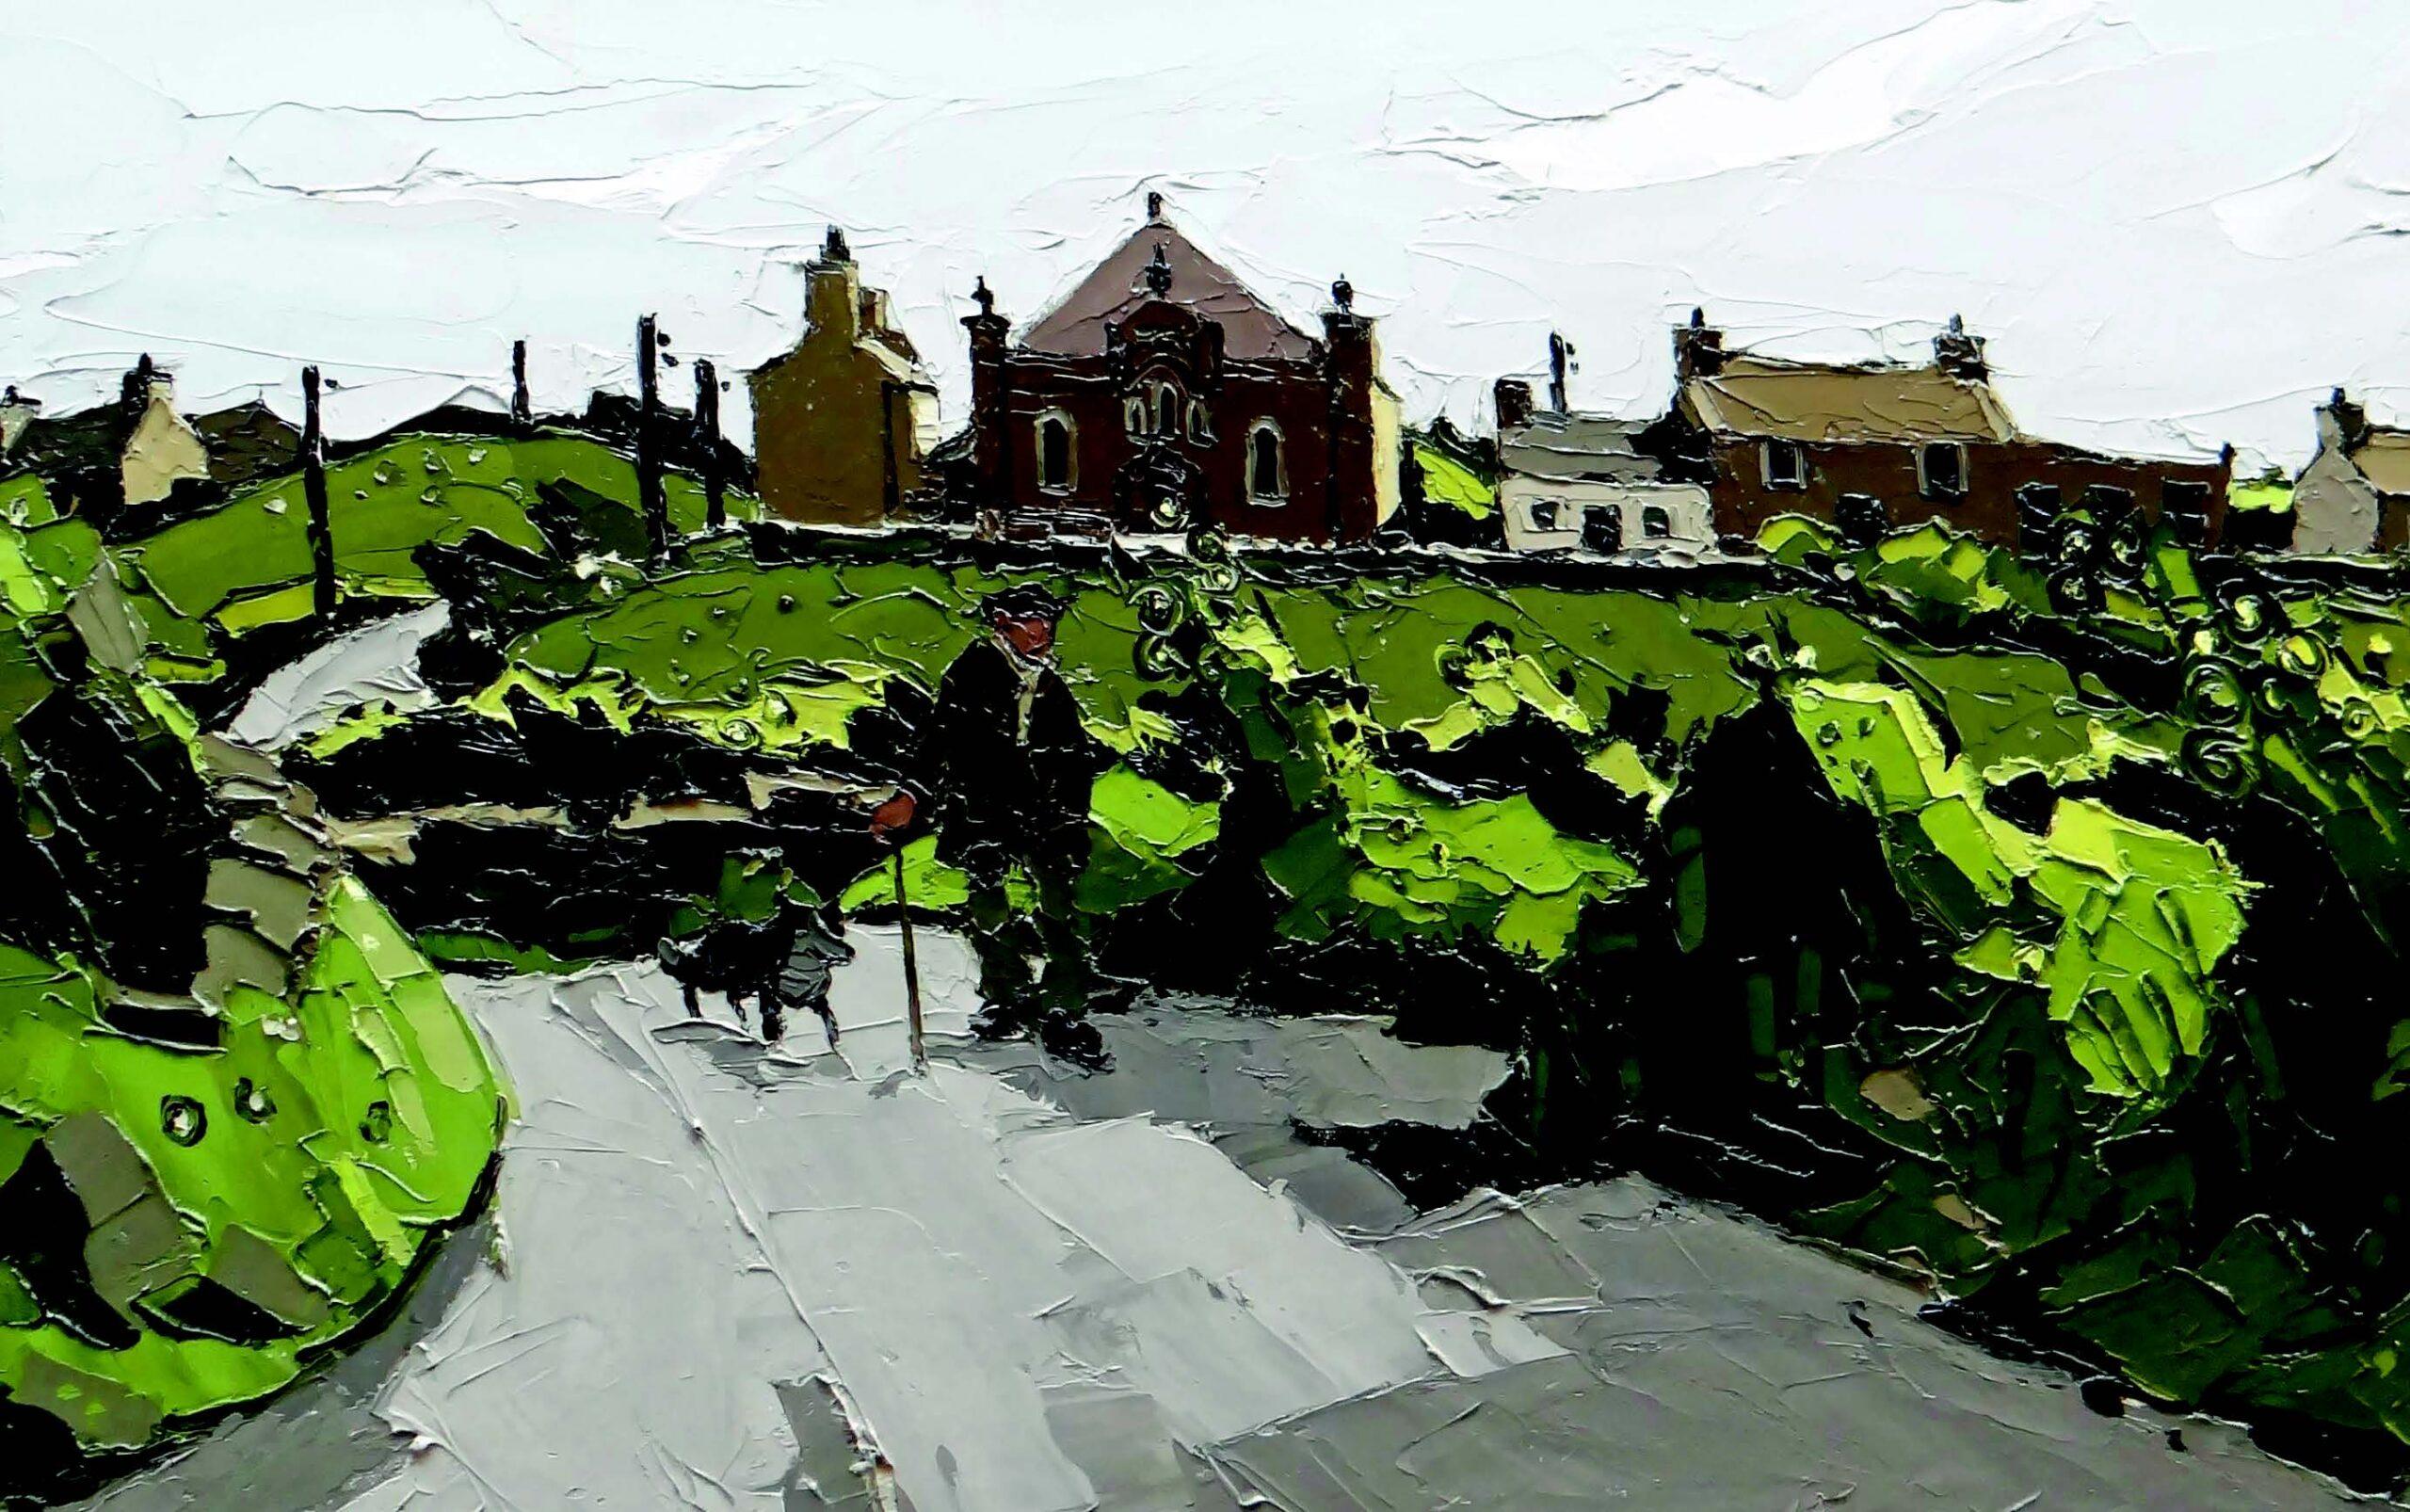 Sir Kyffin Williams' painting